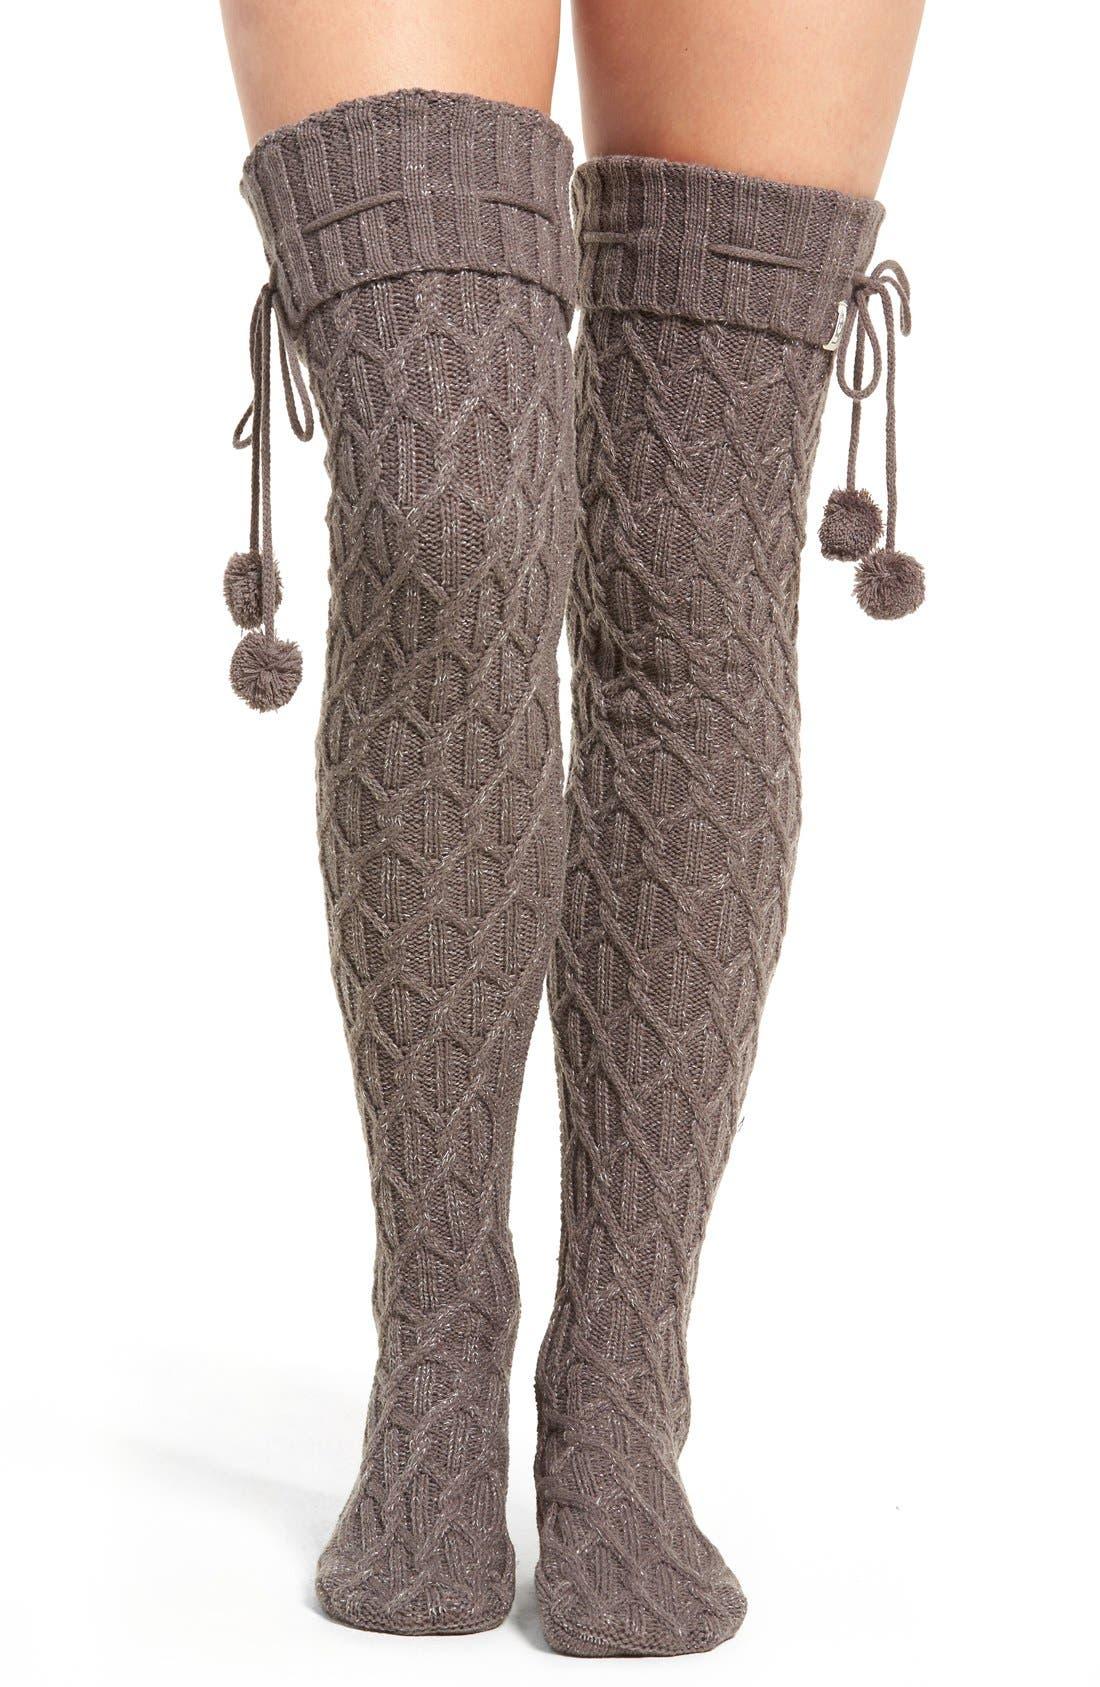 Sparkle Cable Knit Socks,                         Main,                         color, 020